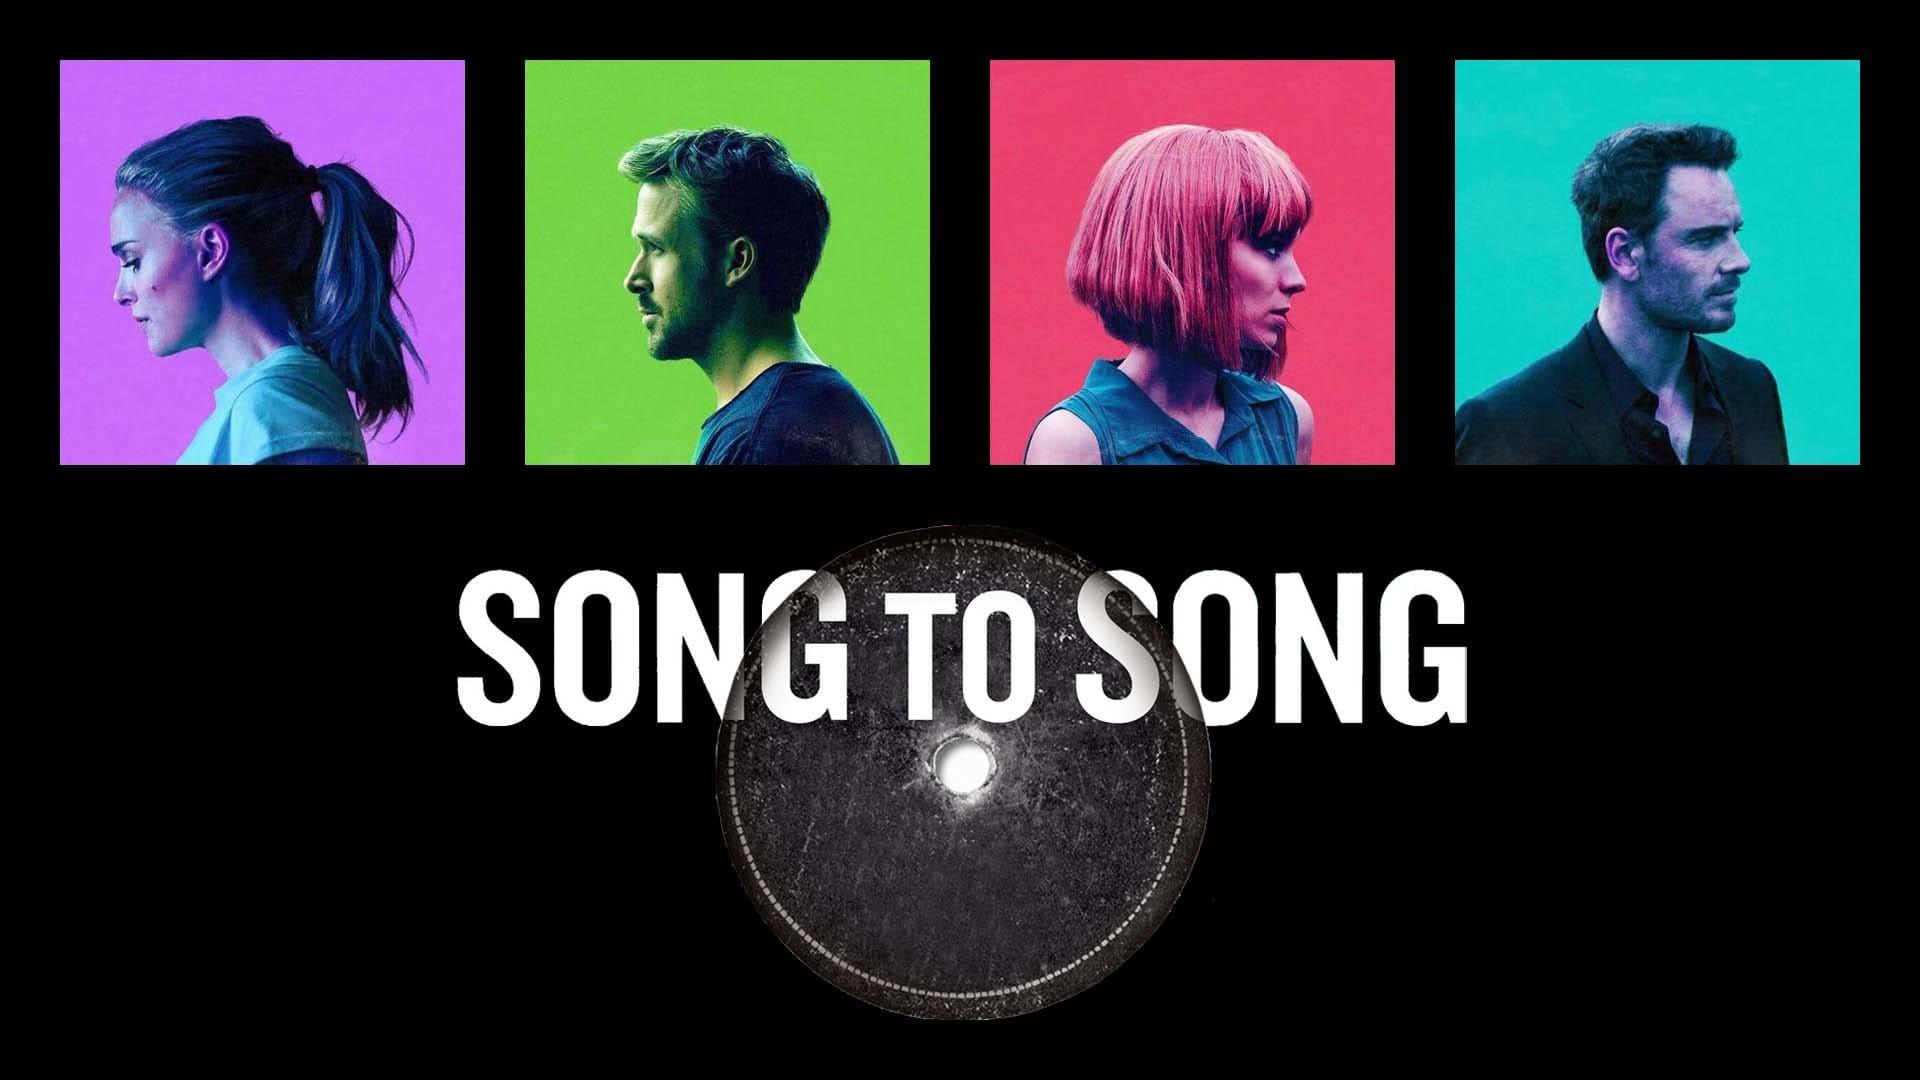 Regarder Song to Song en streaming gratuit